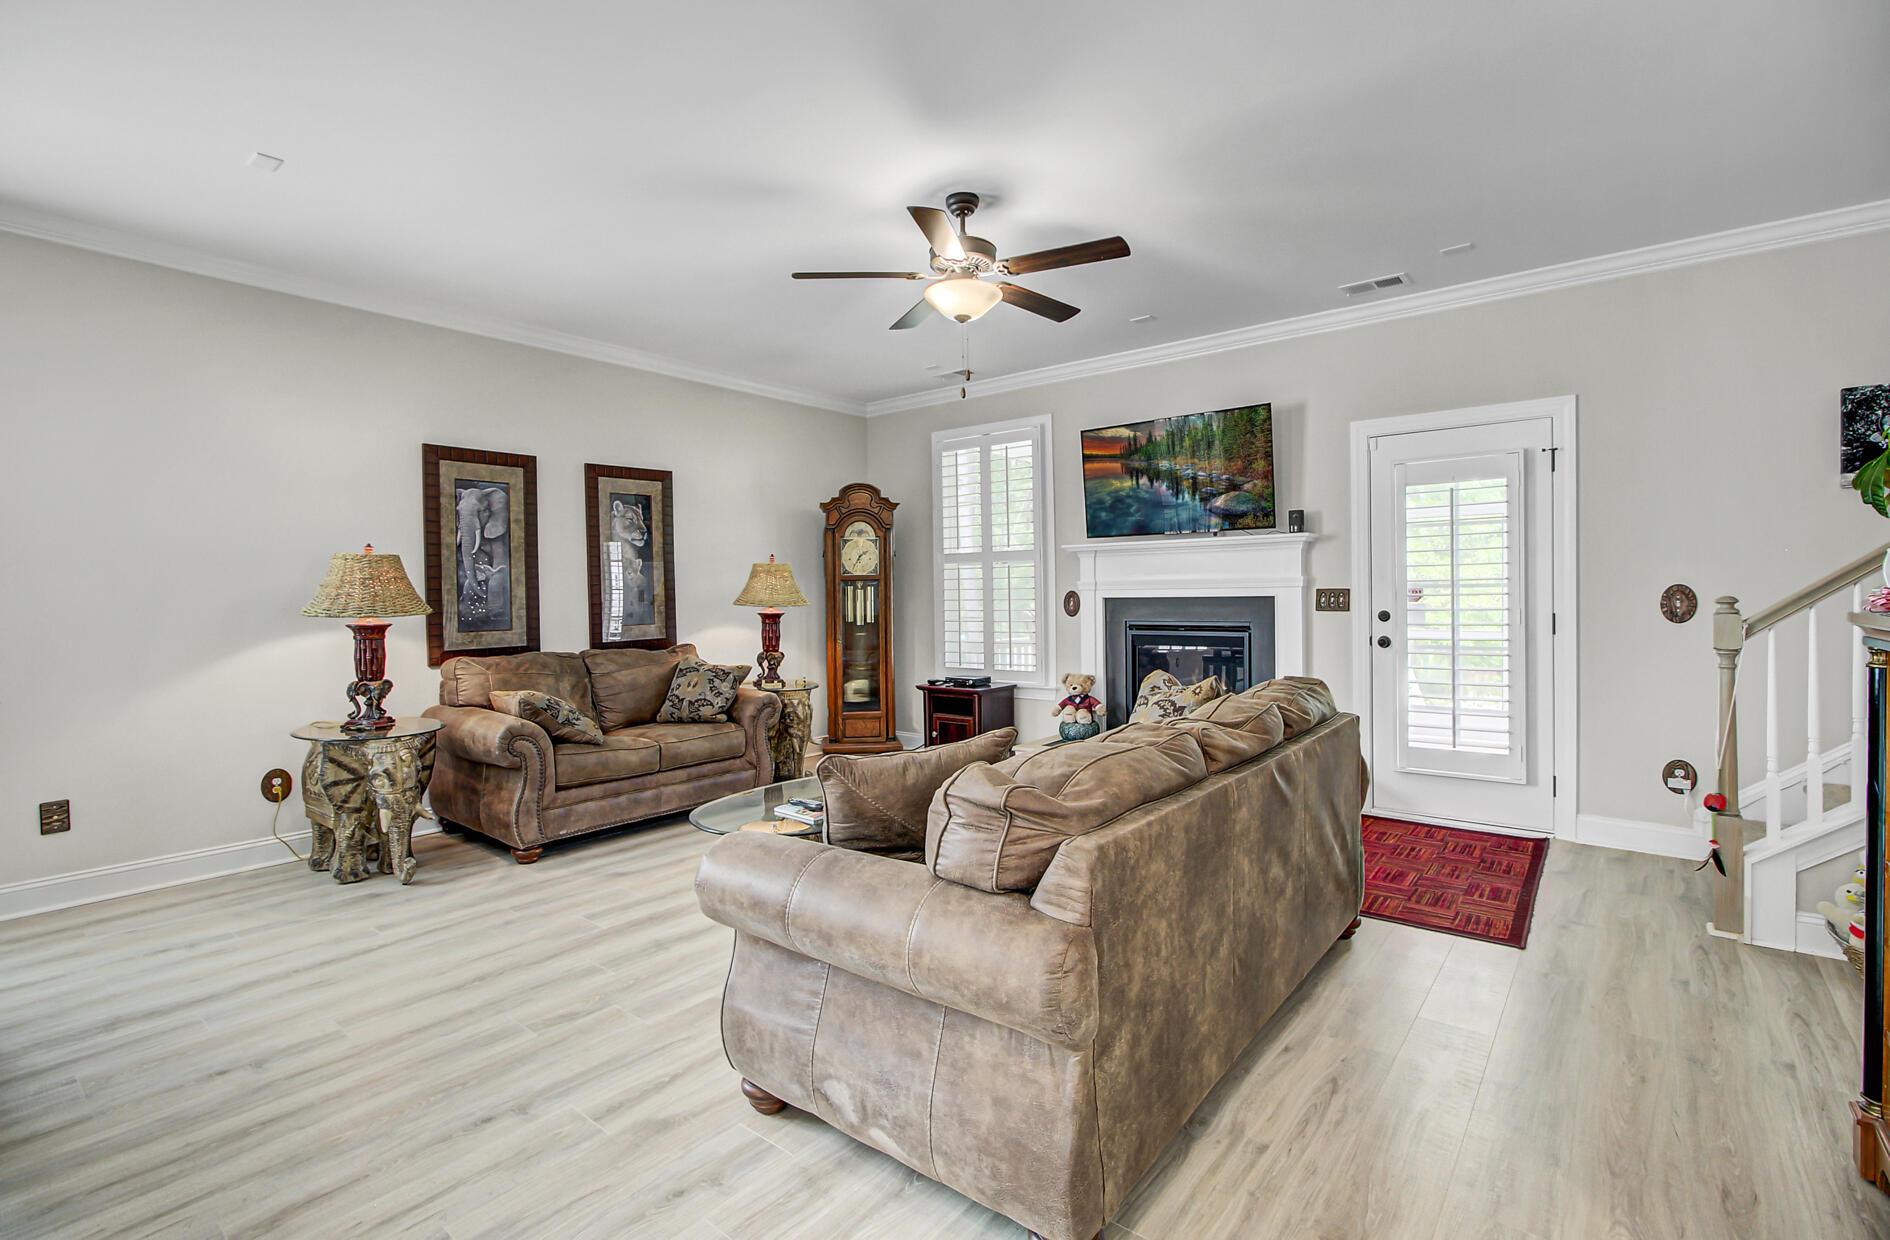 Park West Homes For Sale - 2824 Wagner, Mount Pleasant, SC - 17